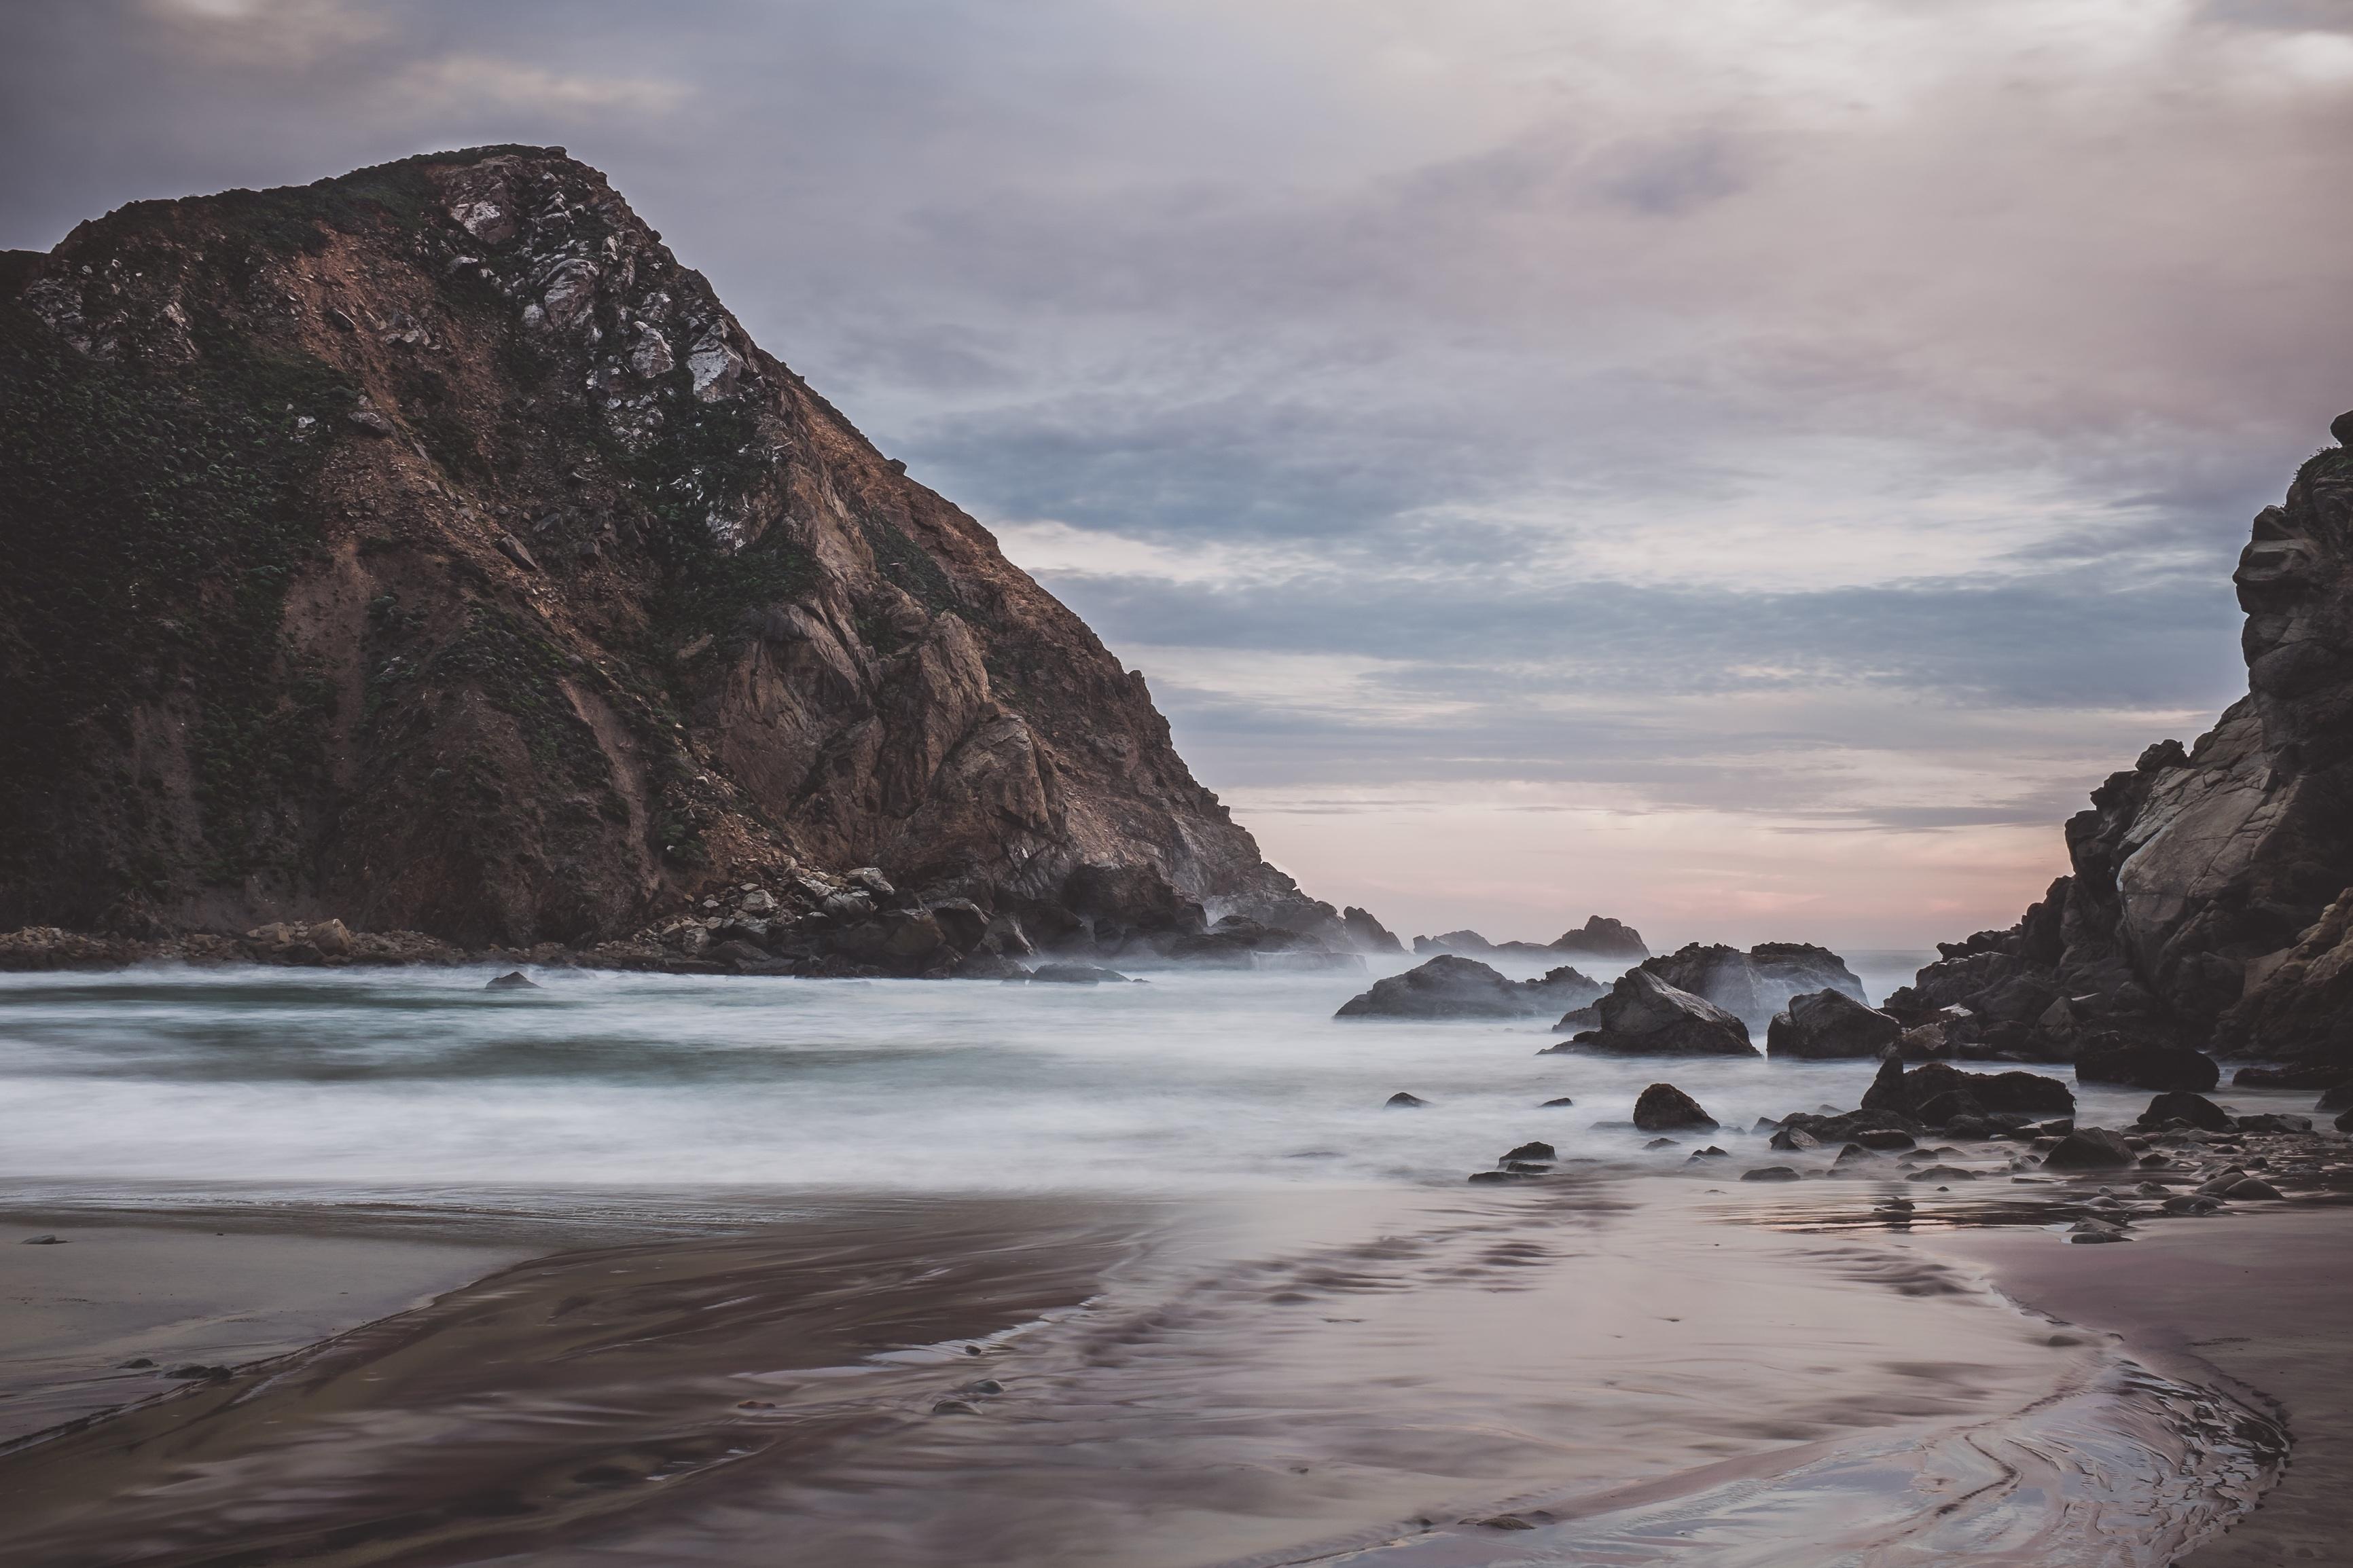 Rocky, Flow, Landscape, Mountain, Rock, HQ Photo